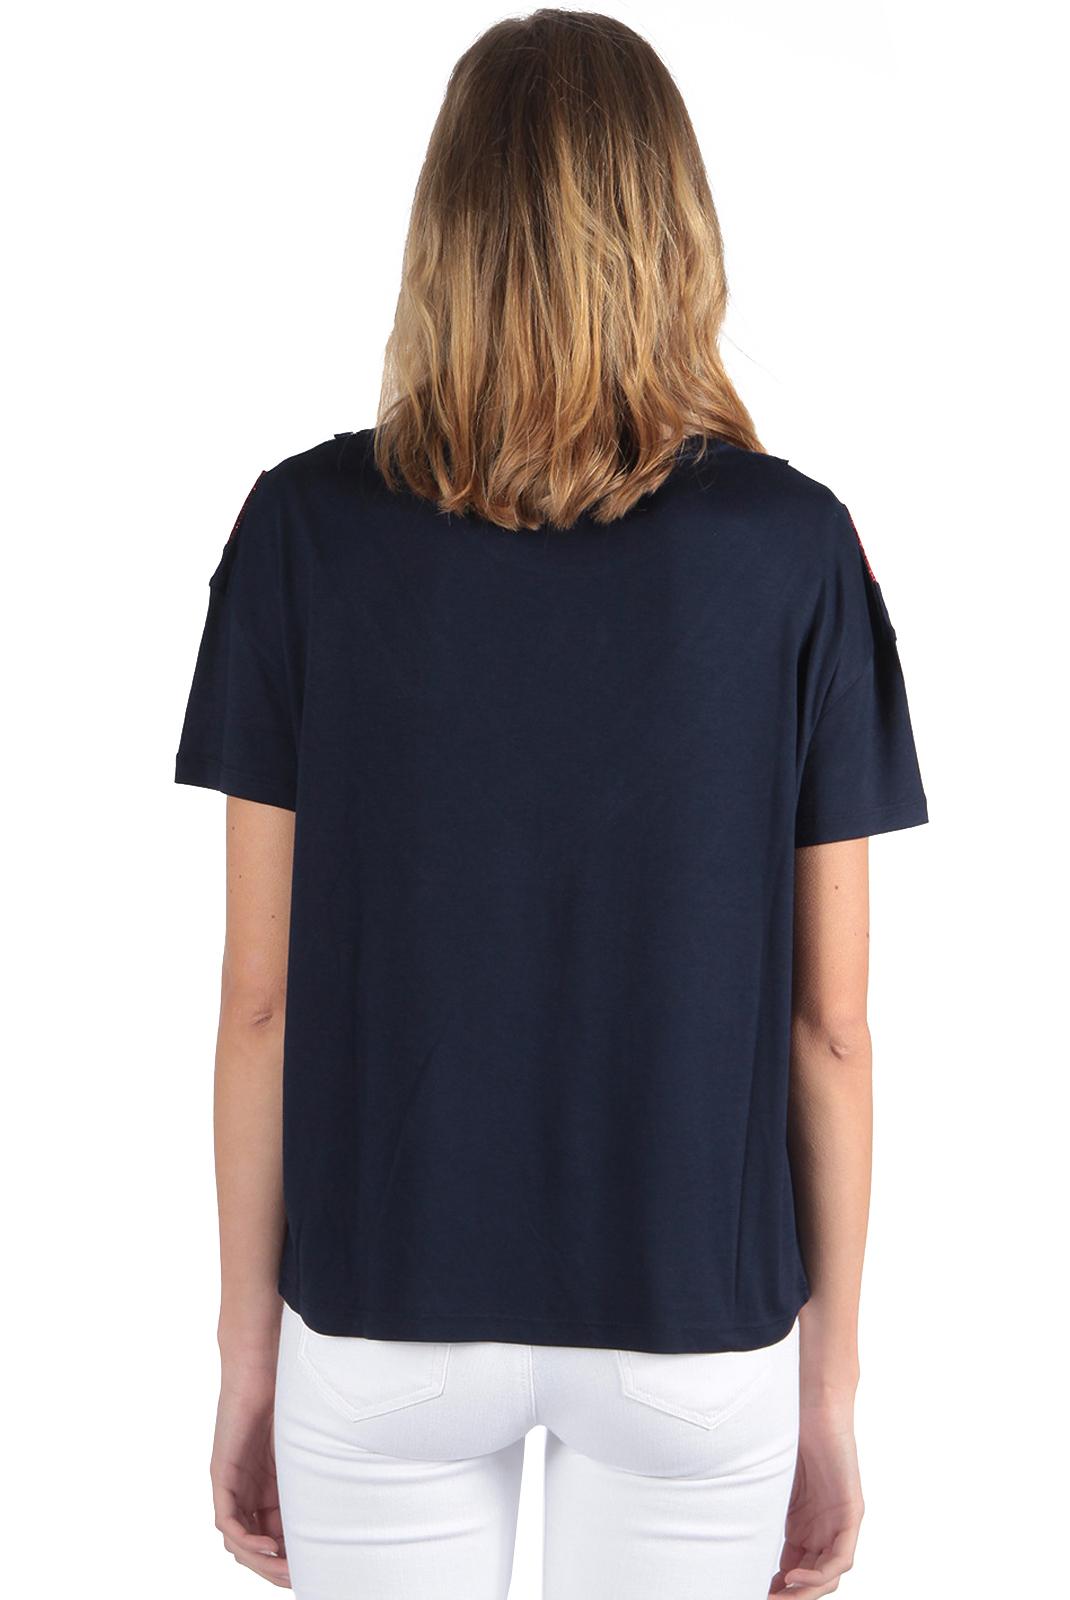 Tee shirt  Kaporal BIVER OUTMER